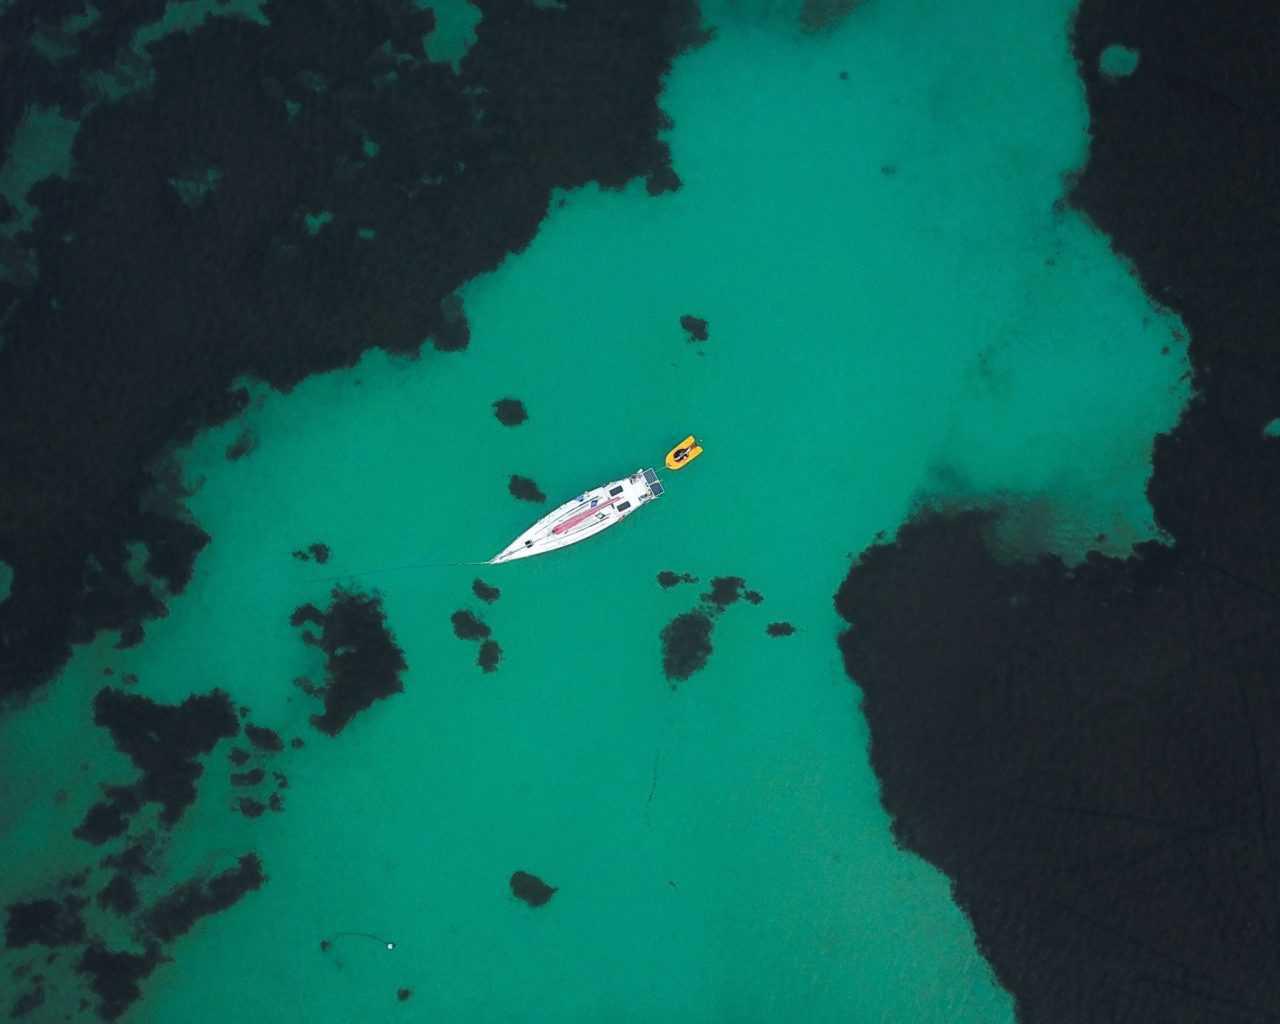 pesquisa marítima